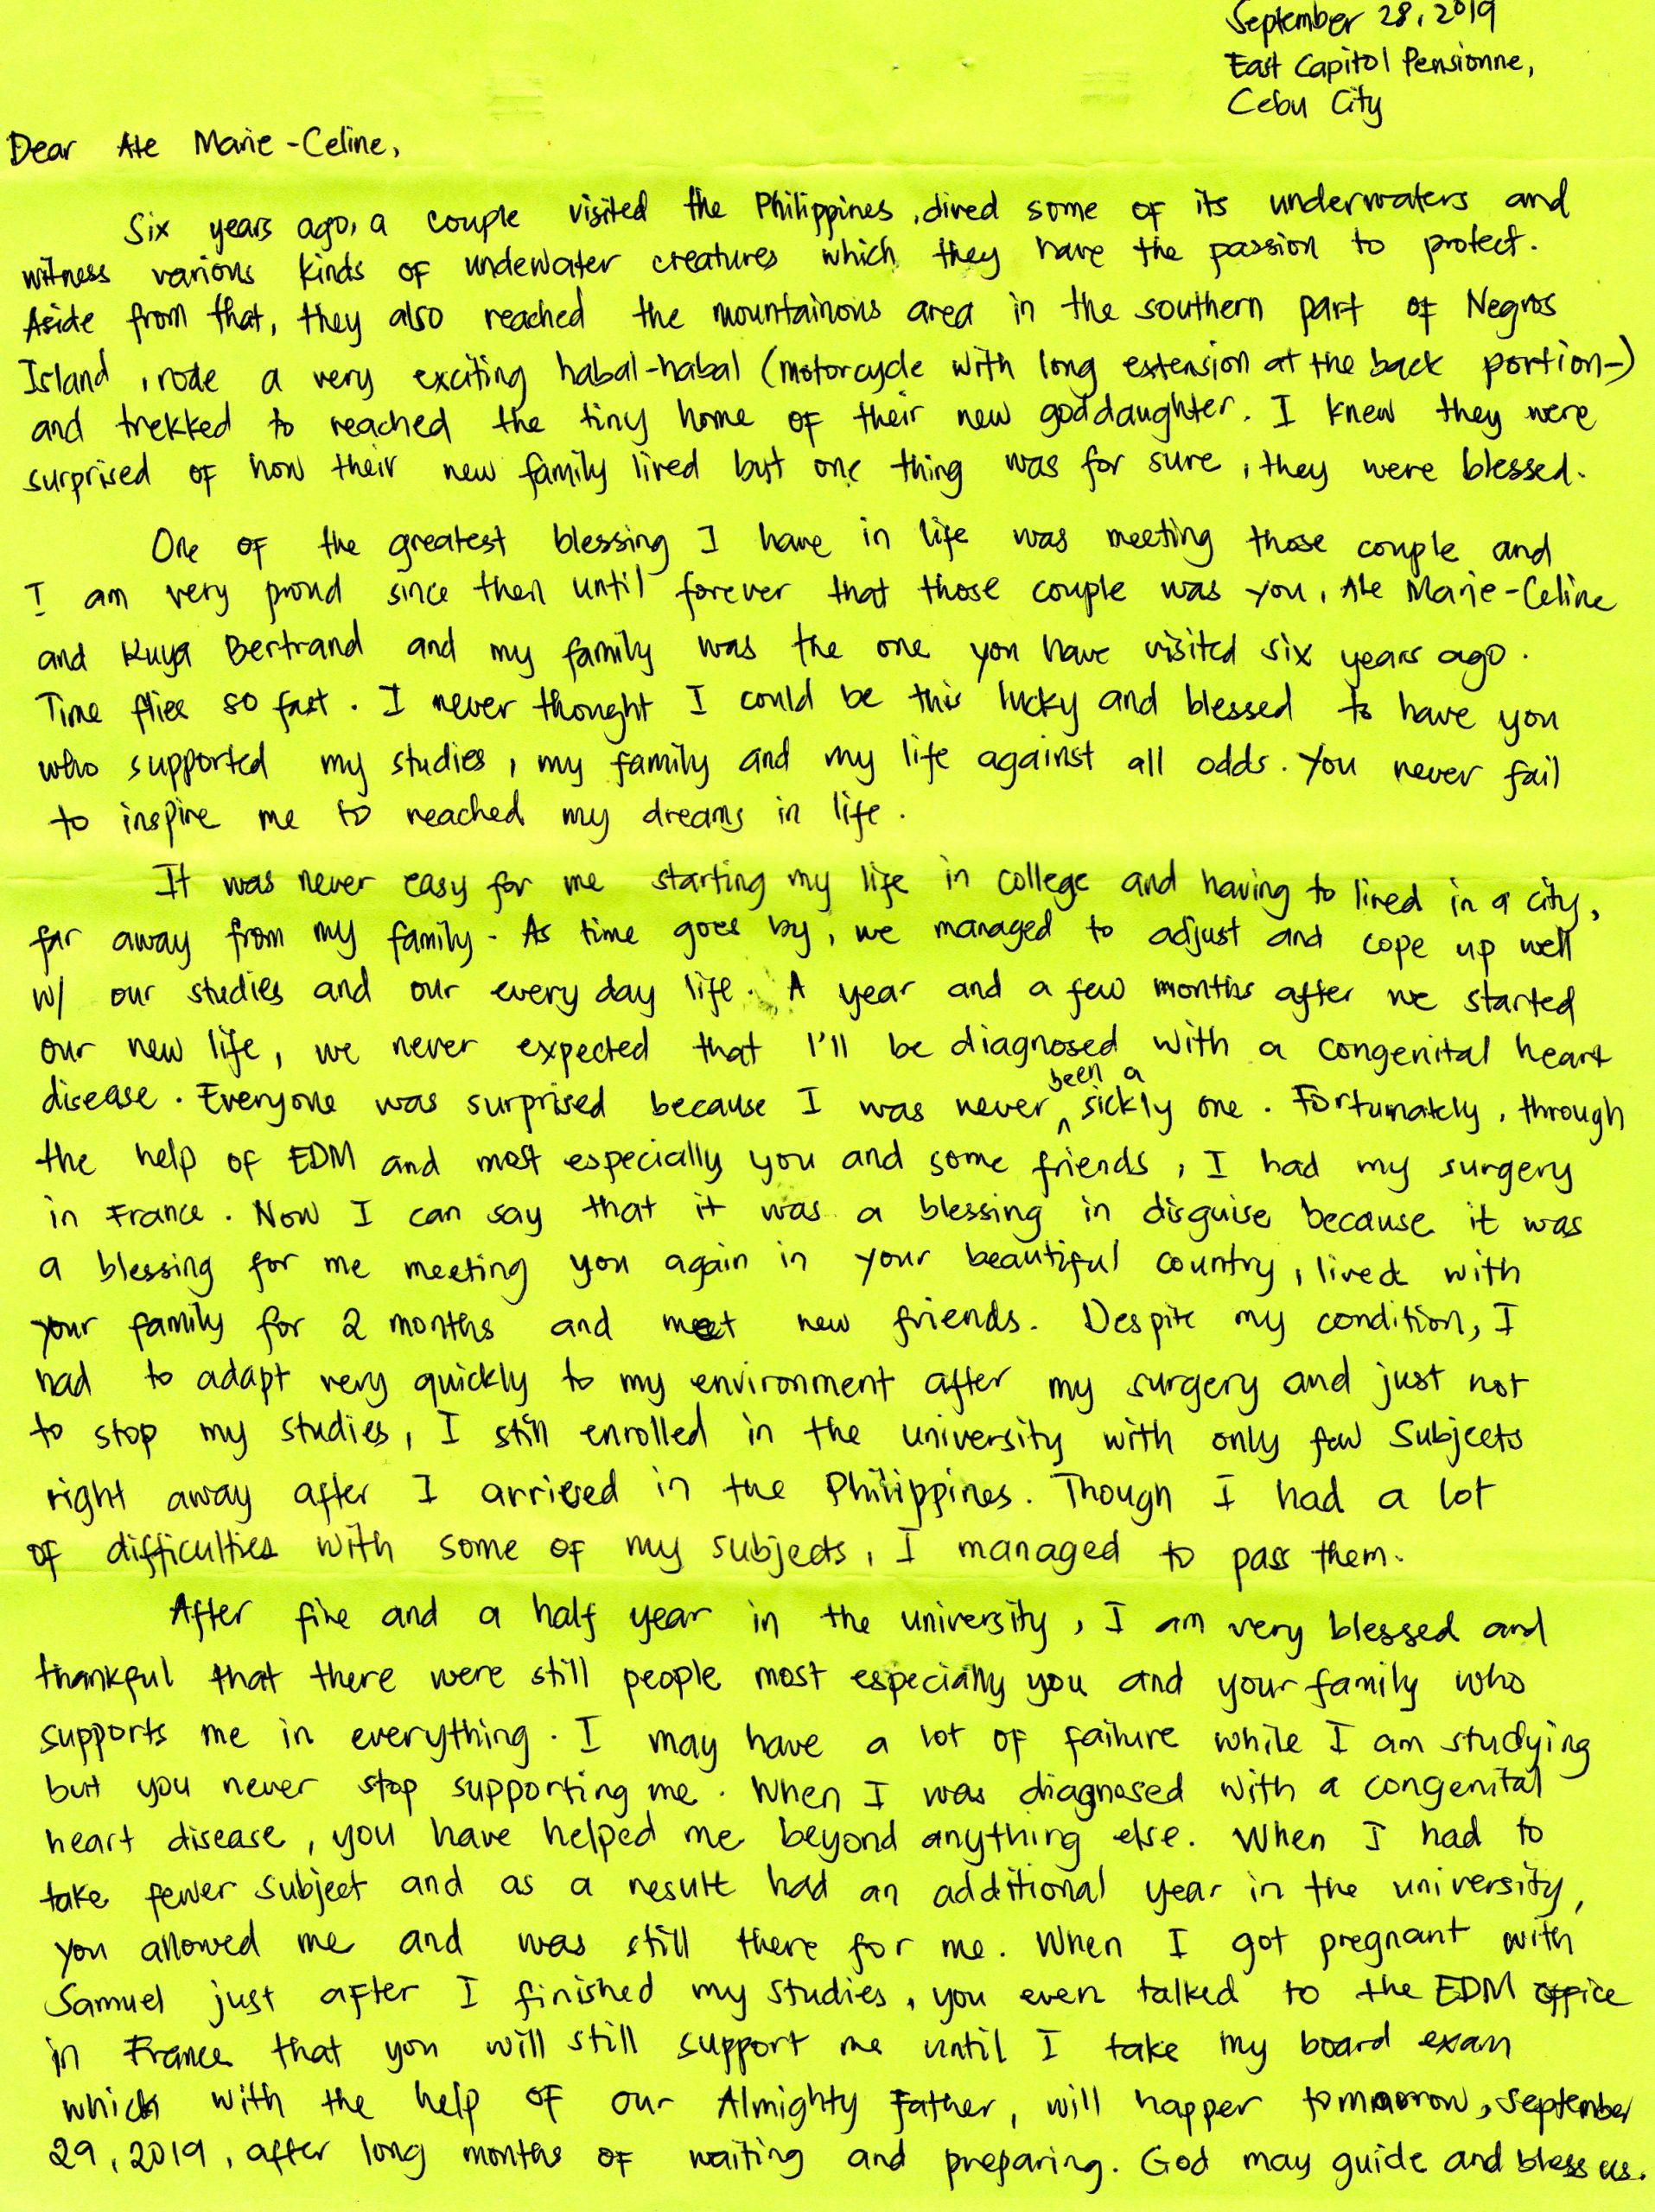 Lettre de Raiza, filleule philippine